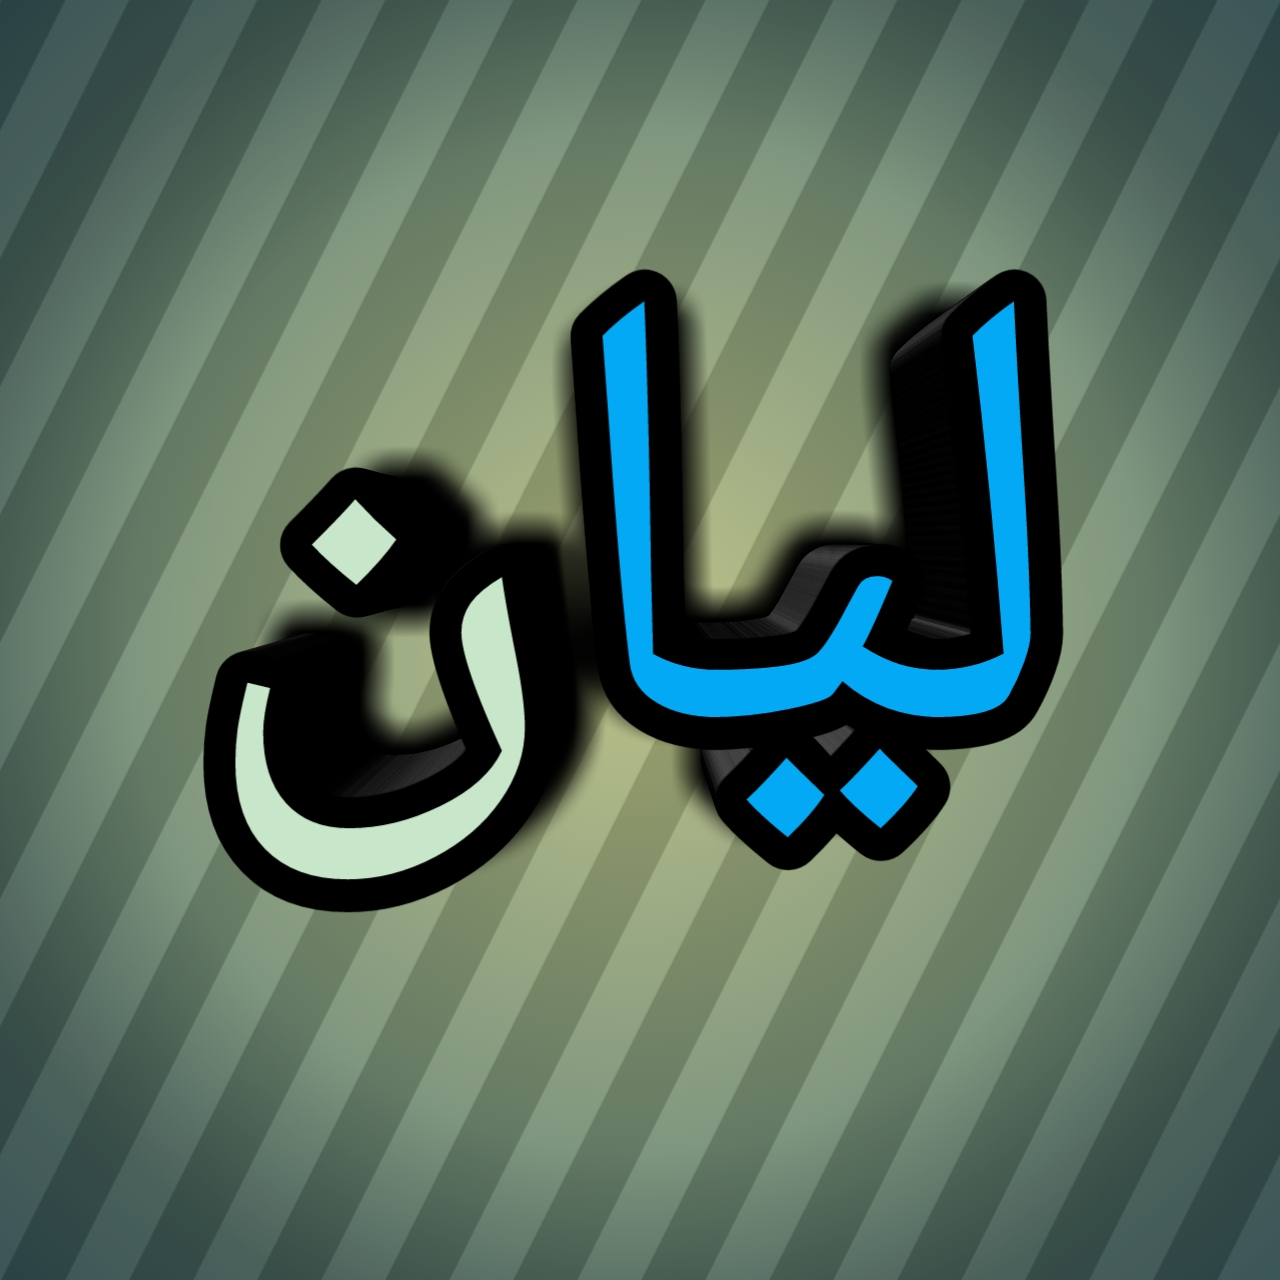 Mc Ghalib صور اسم ليان Layan جديد2020 ومعنى الاسم في قاموس المعاني